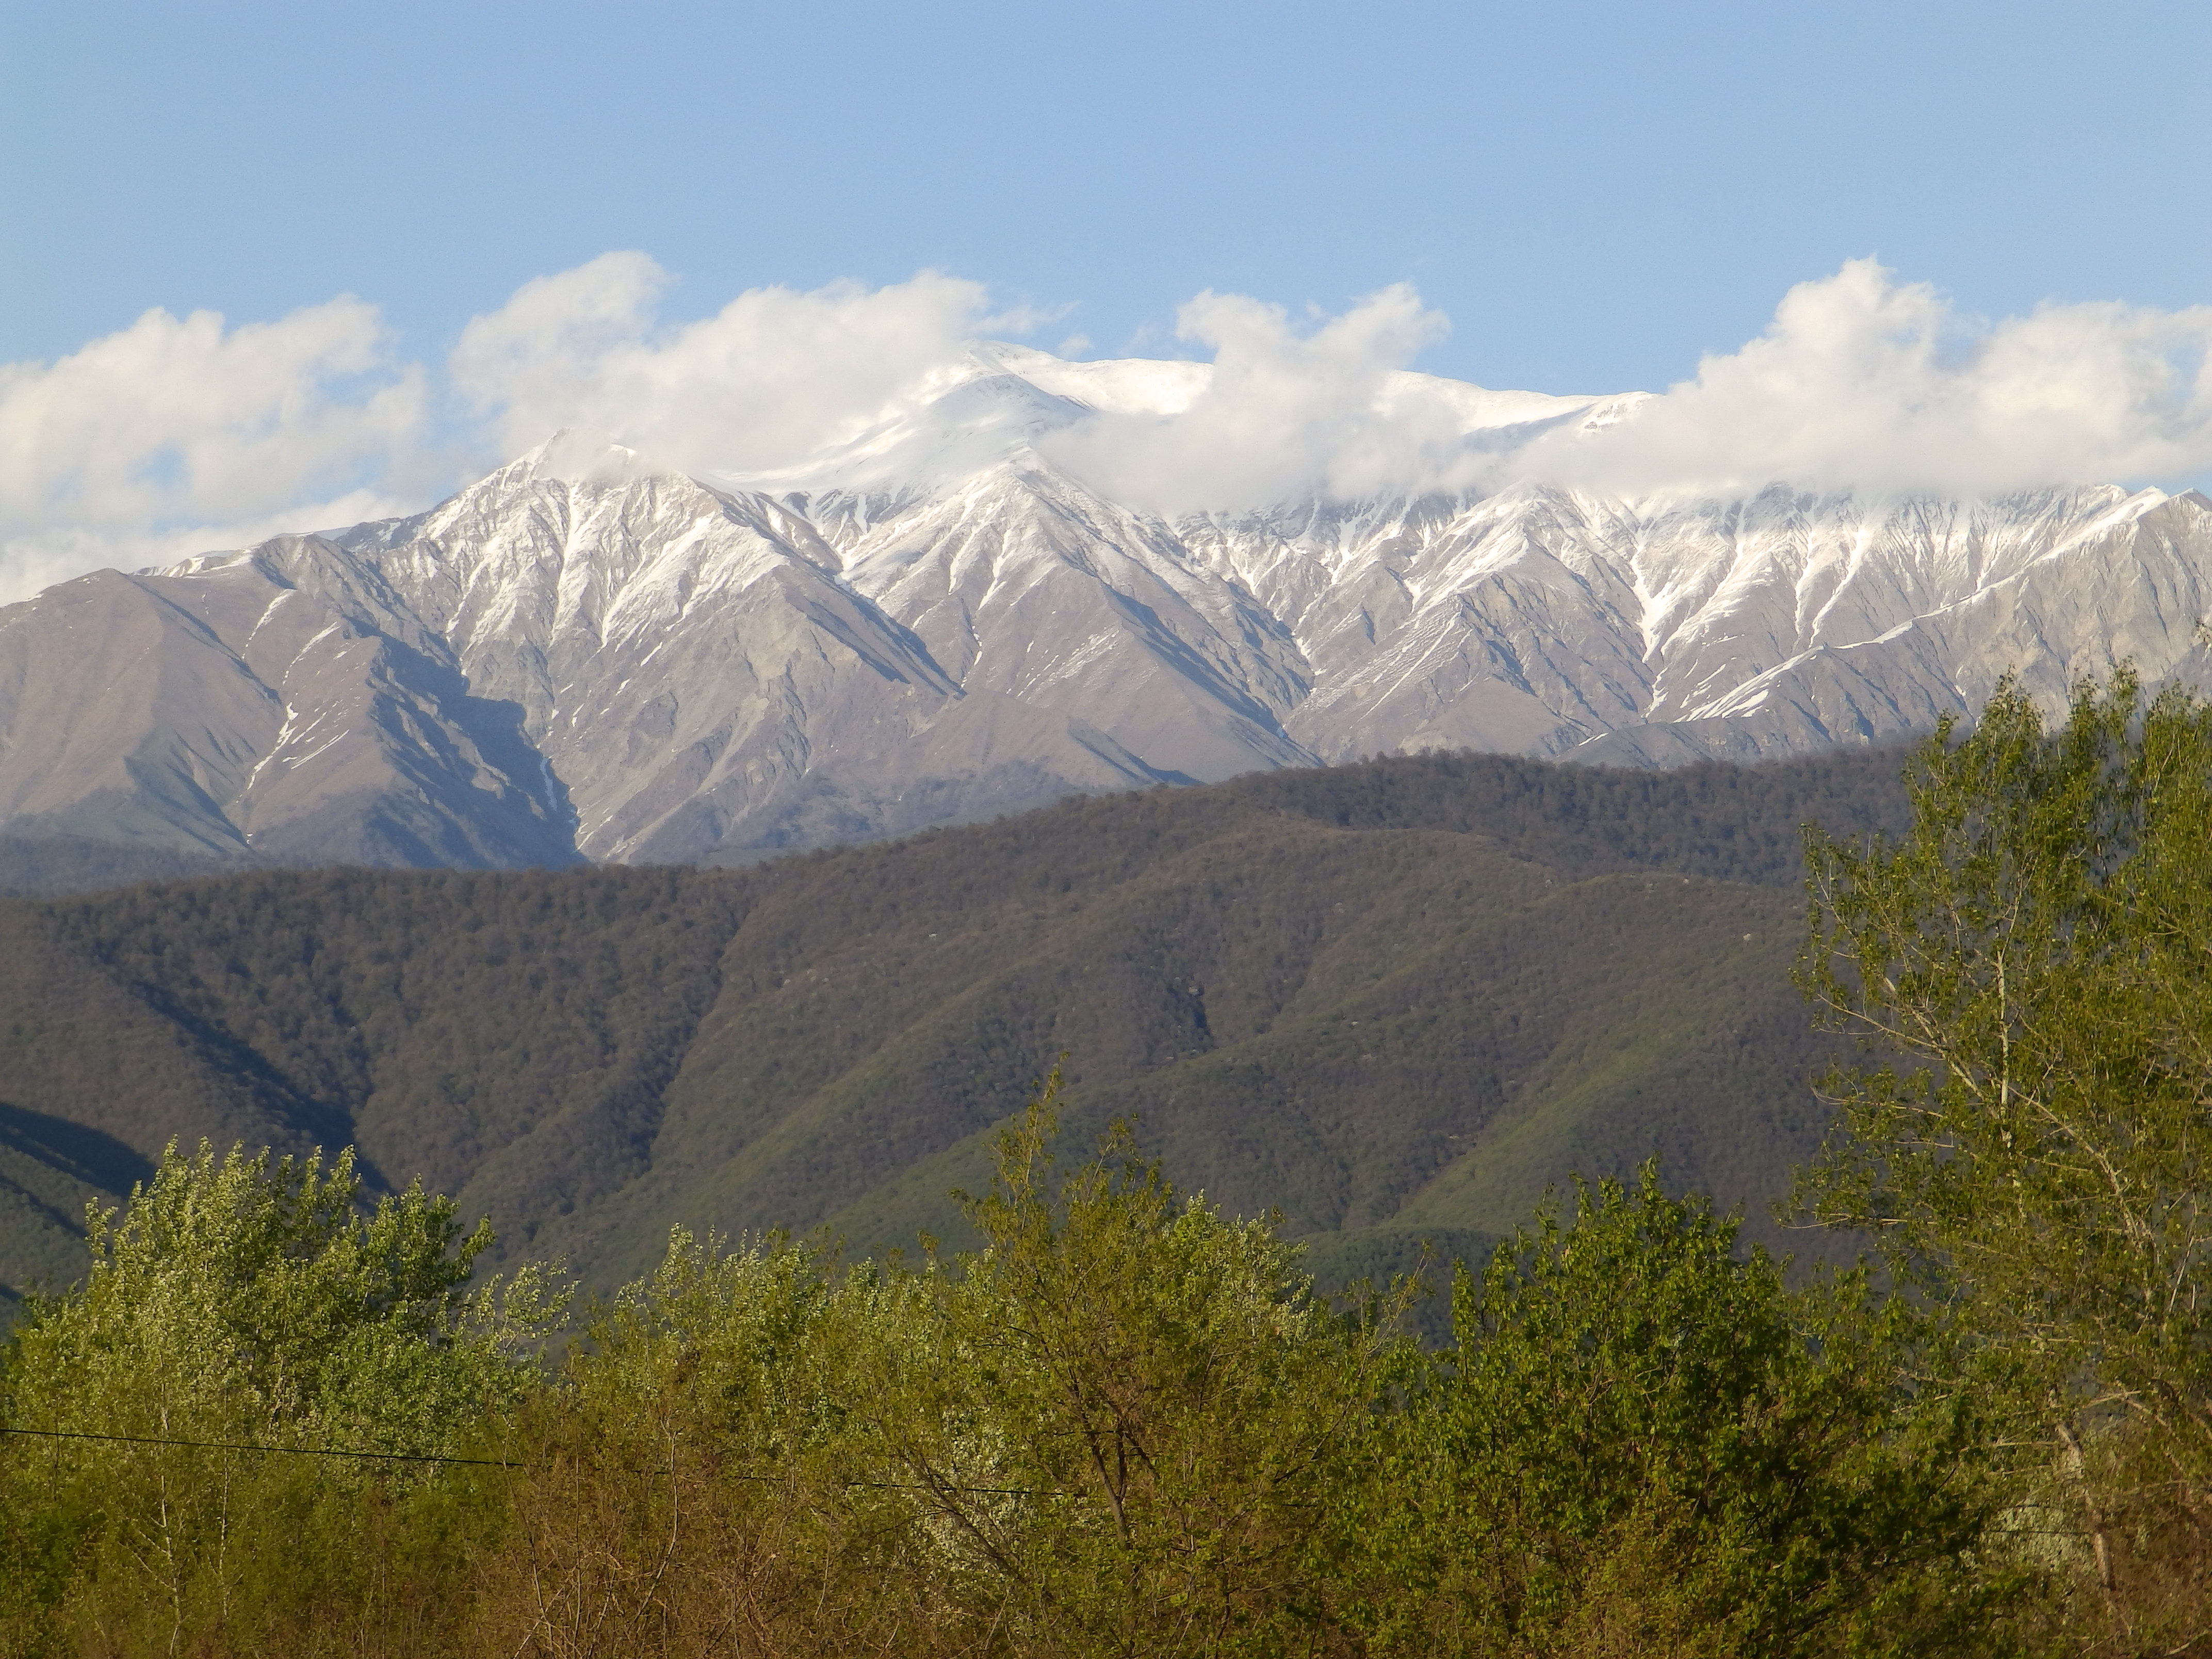 Azeri_LandscapesP4150089